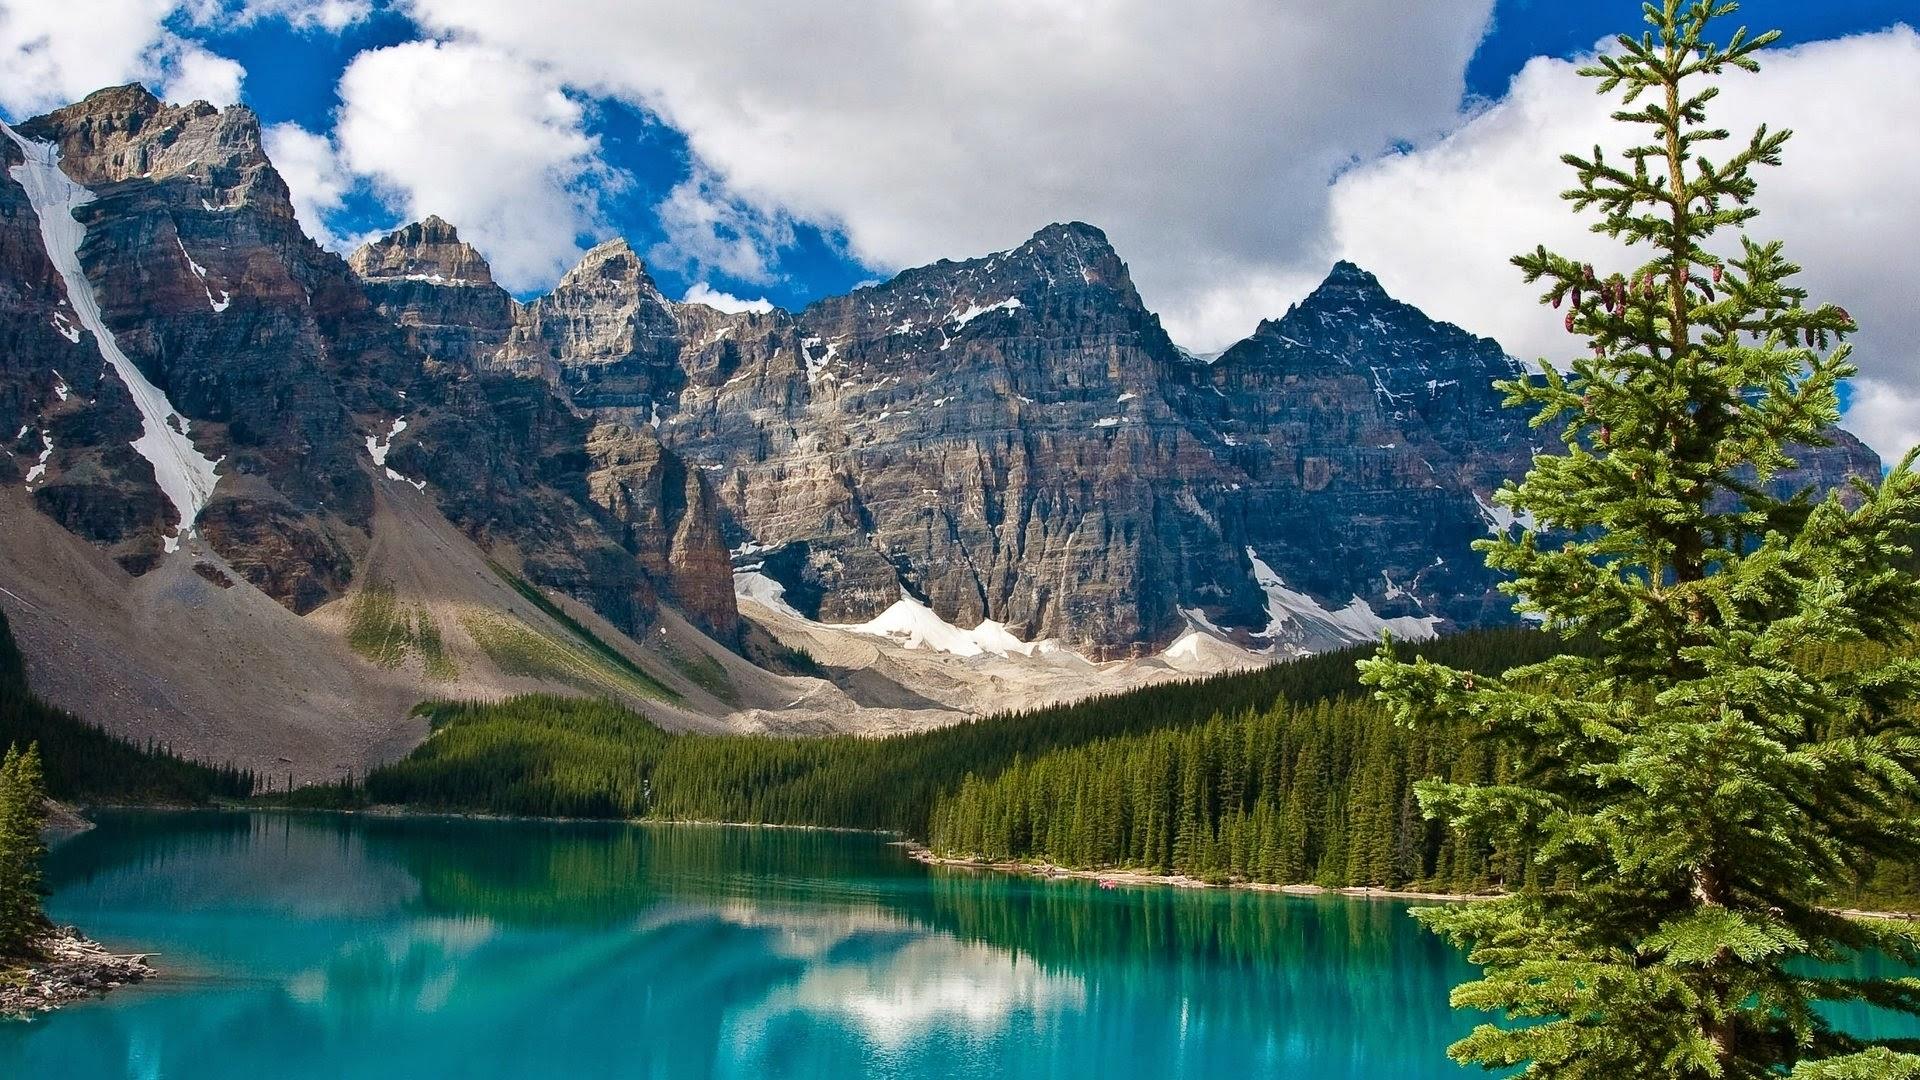 rocky-mountain-national-park-desktop-background - Bristol Mountain Home